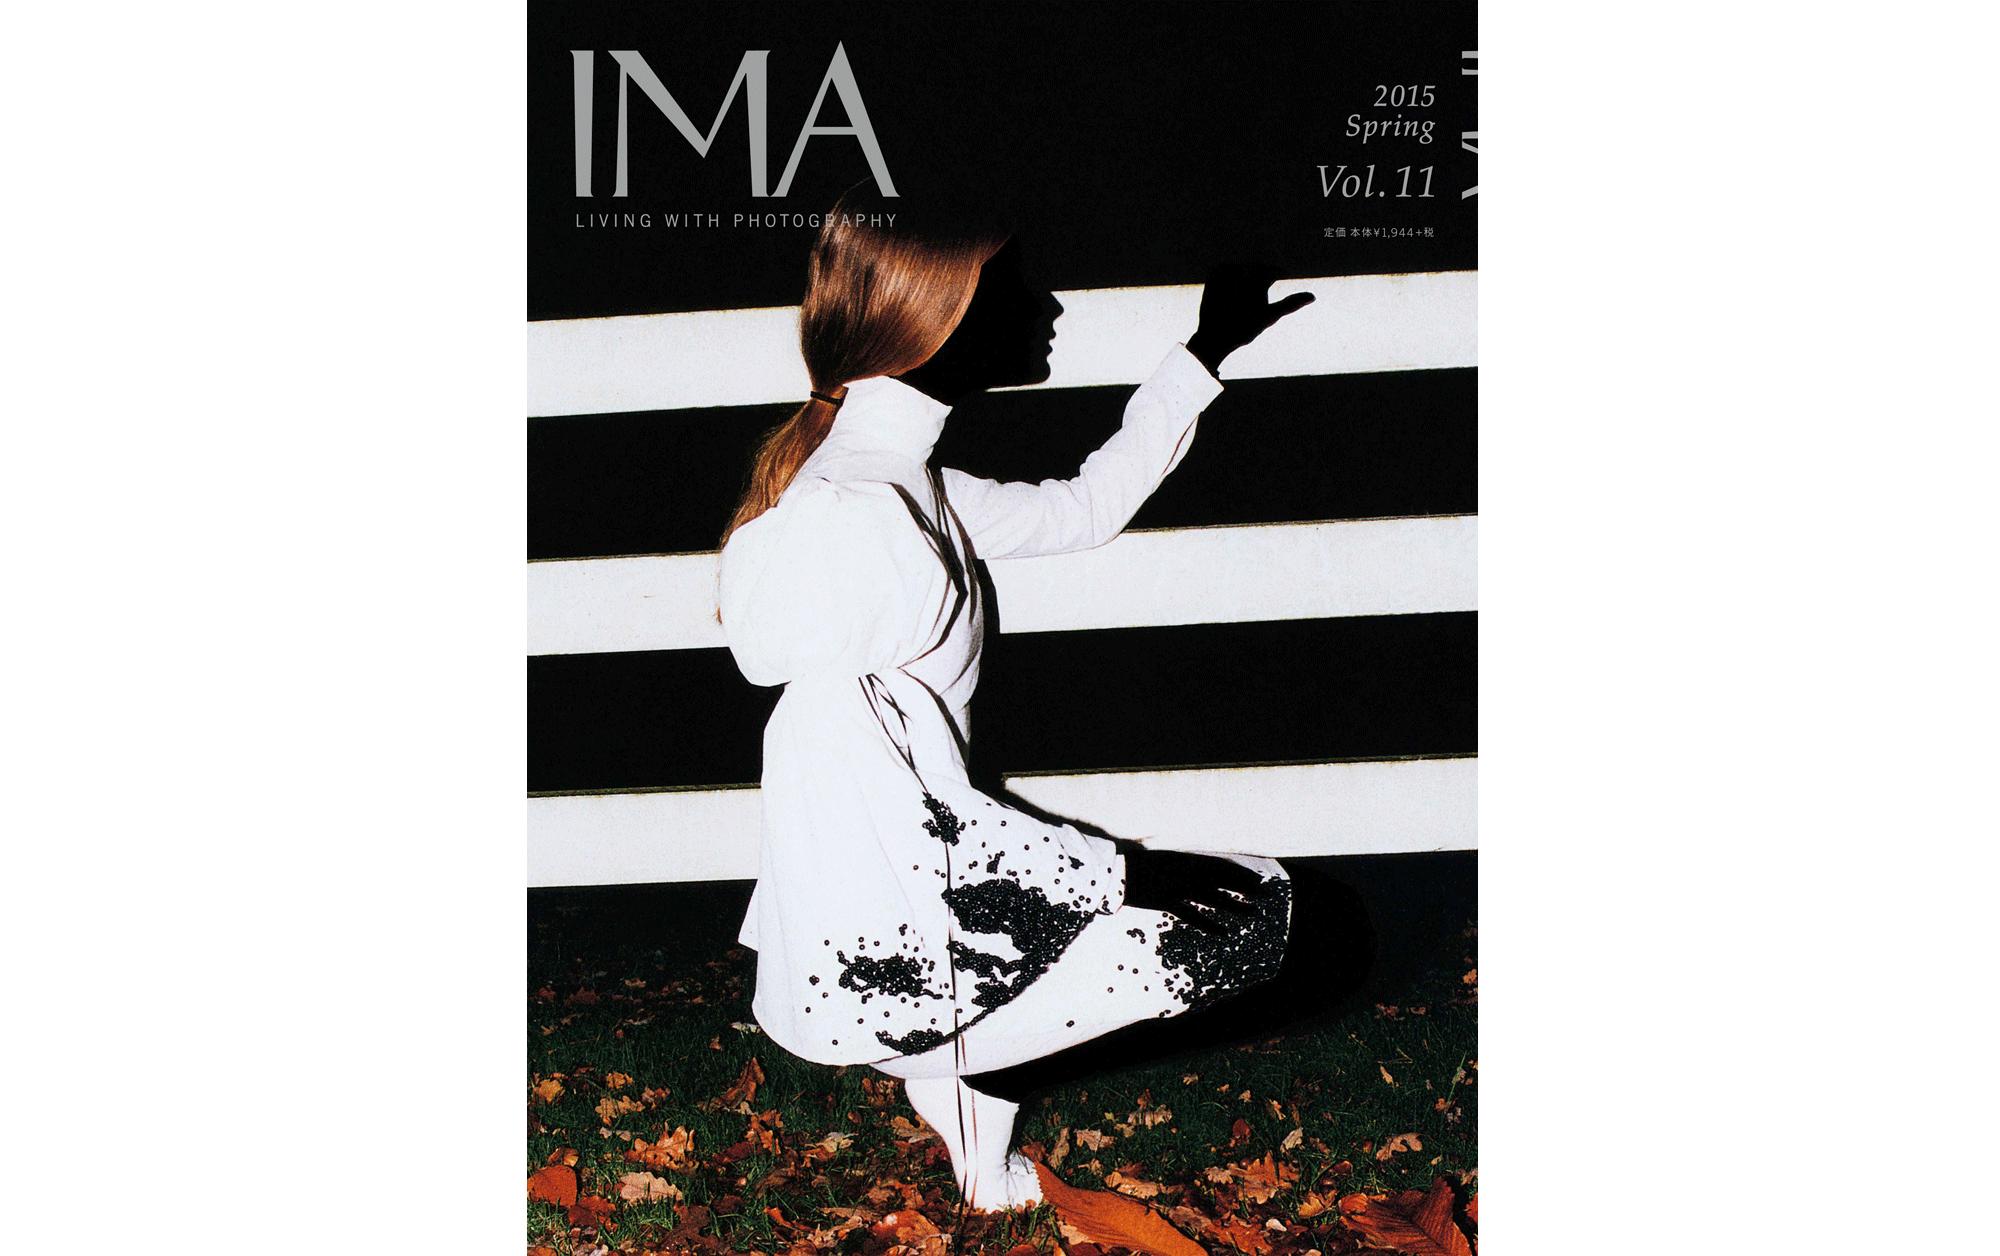 IMA 2015 Spring Vol.11